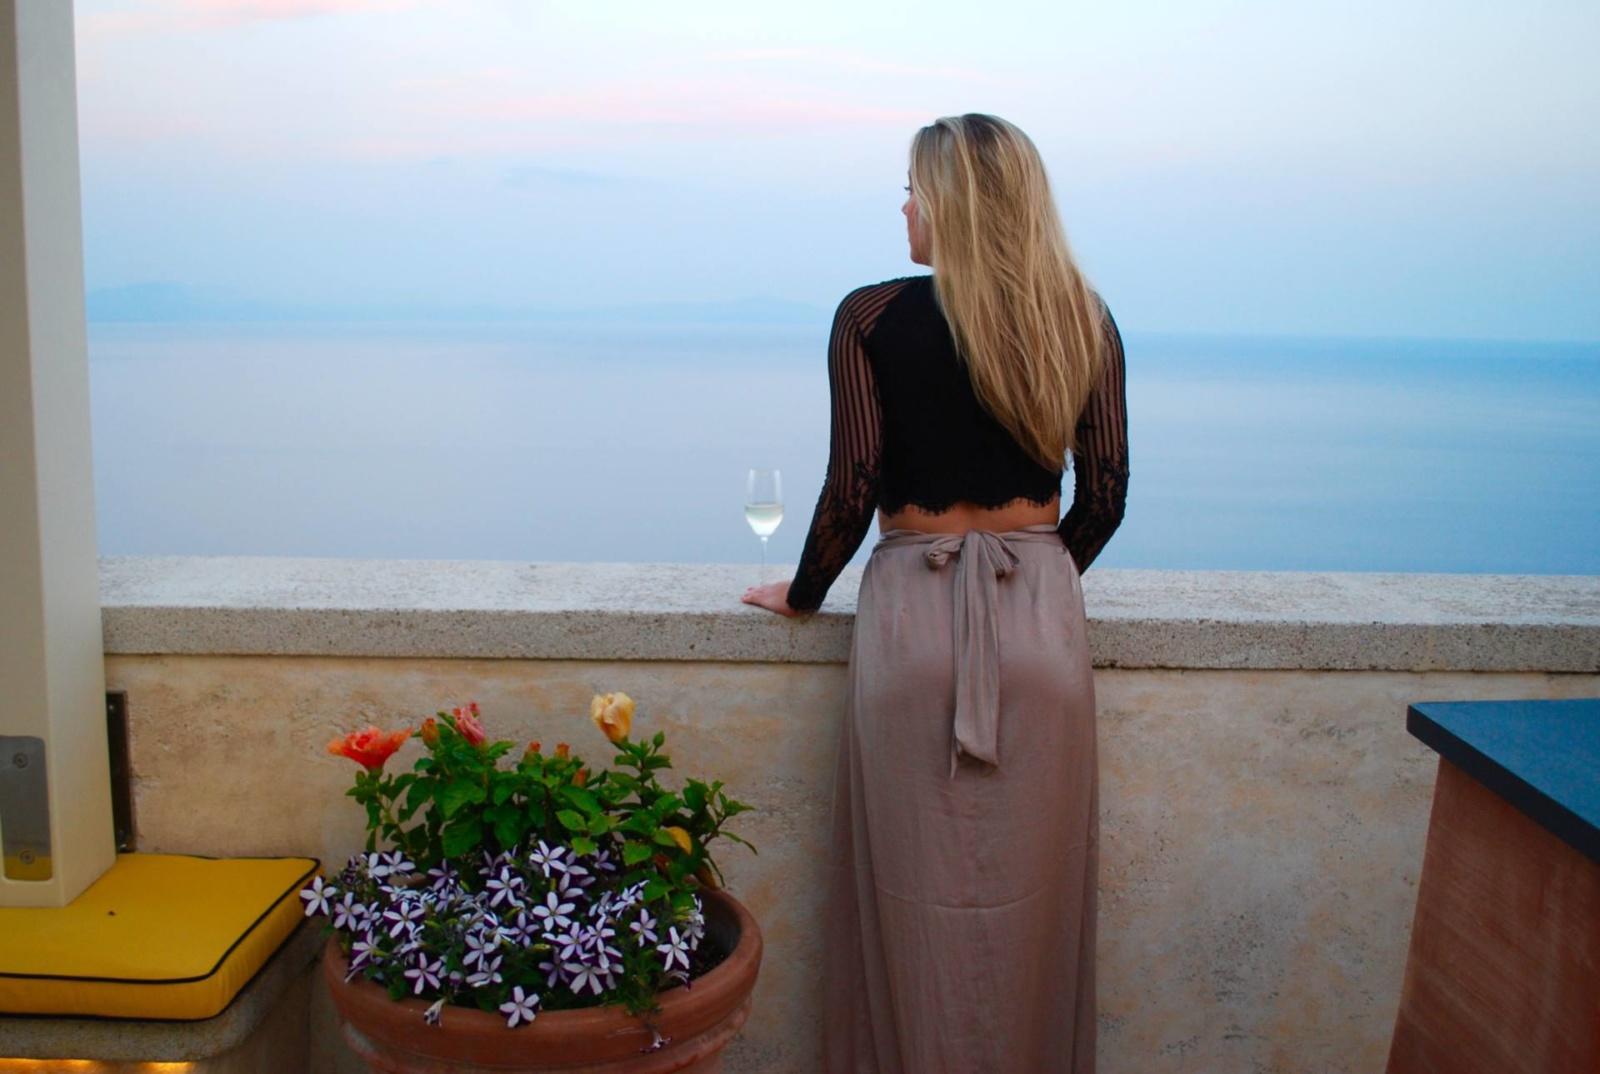 monastero-santa-rosa-amalfi-the-travelista-jess-gibson